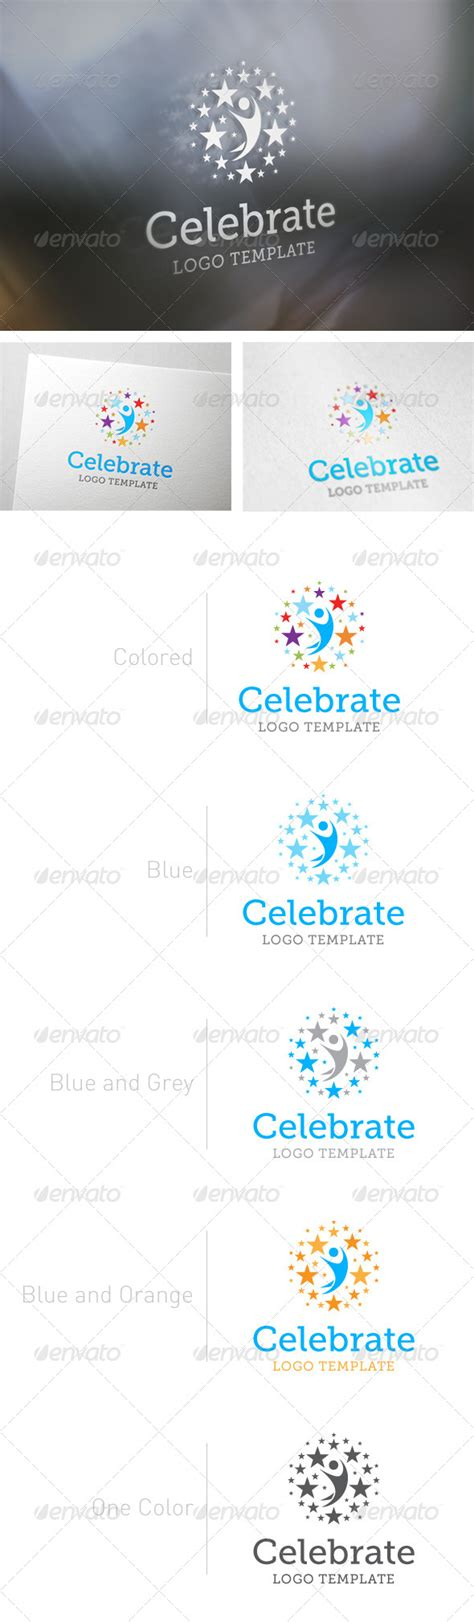 celebrate it templates celebrate it templates cloudinvitation